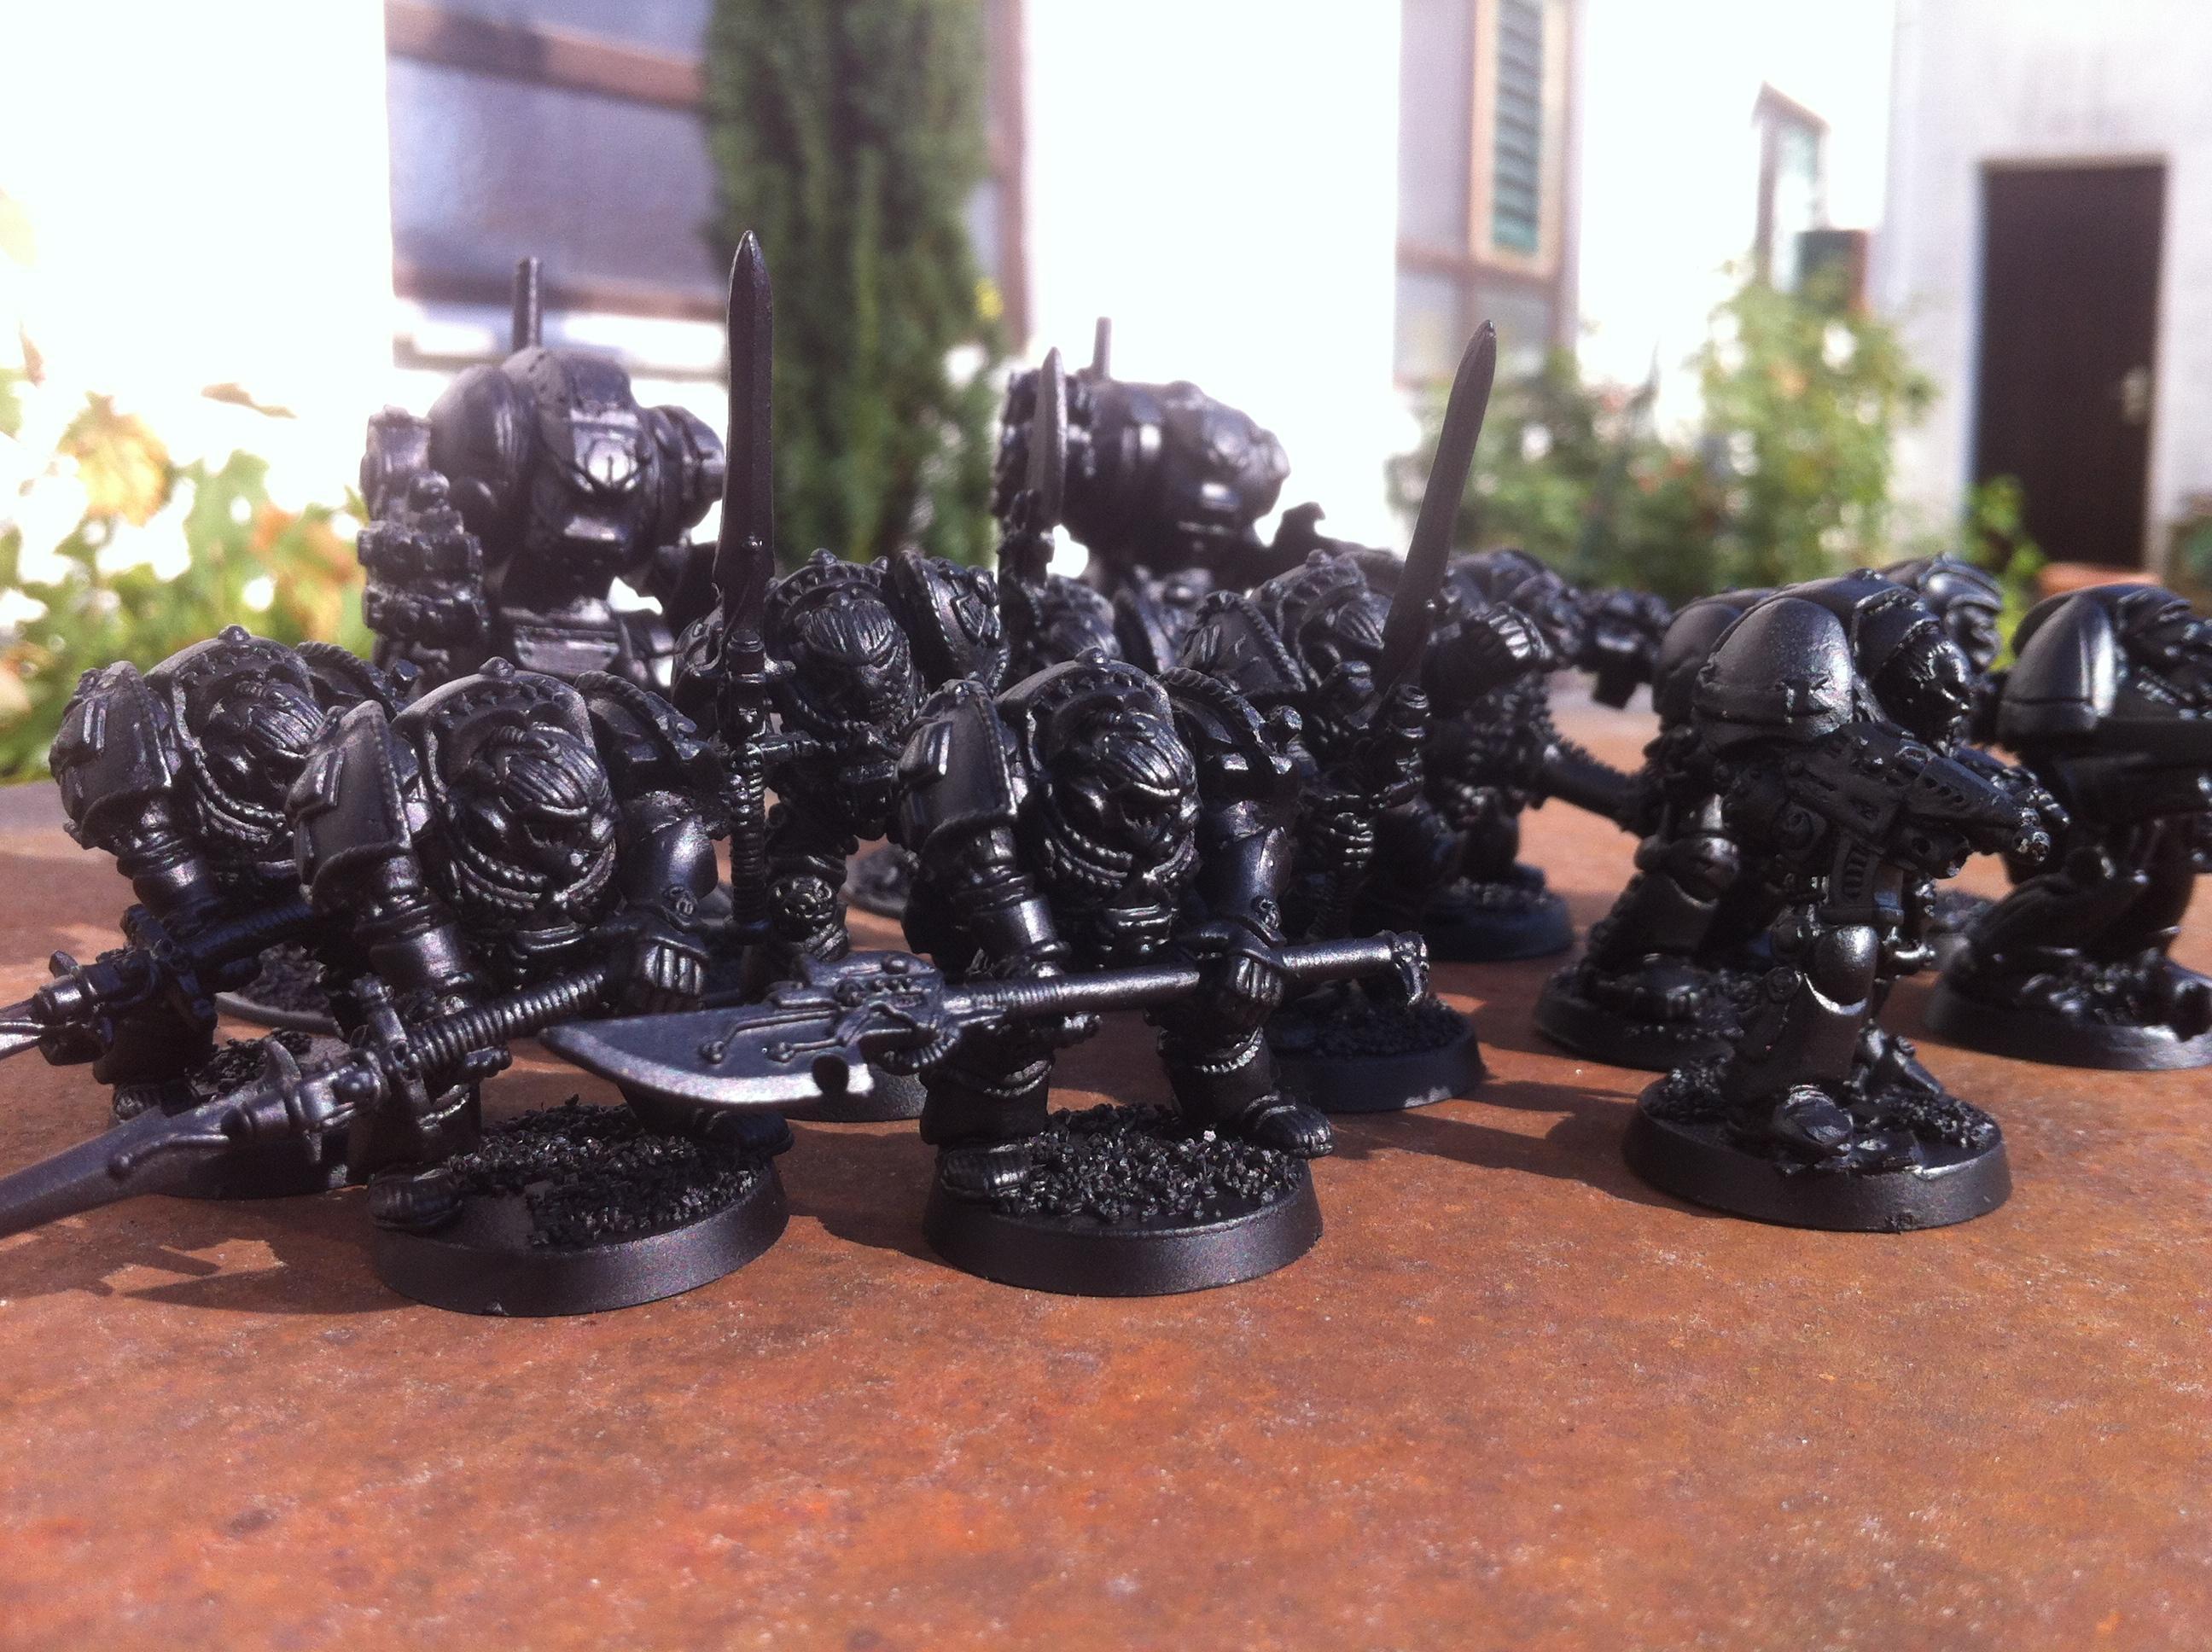 Dreadnought, Epistularius, Furibundus, Grey, Inquisitor, Knights, Old, Oldschool, Psyker, Rogue, Trader, Work In Progress